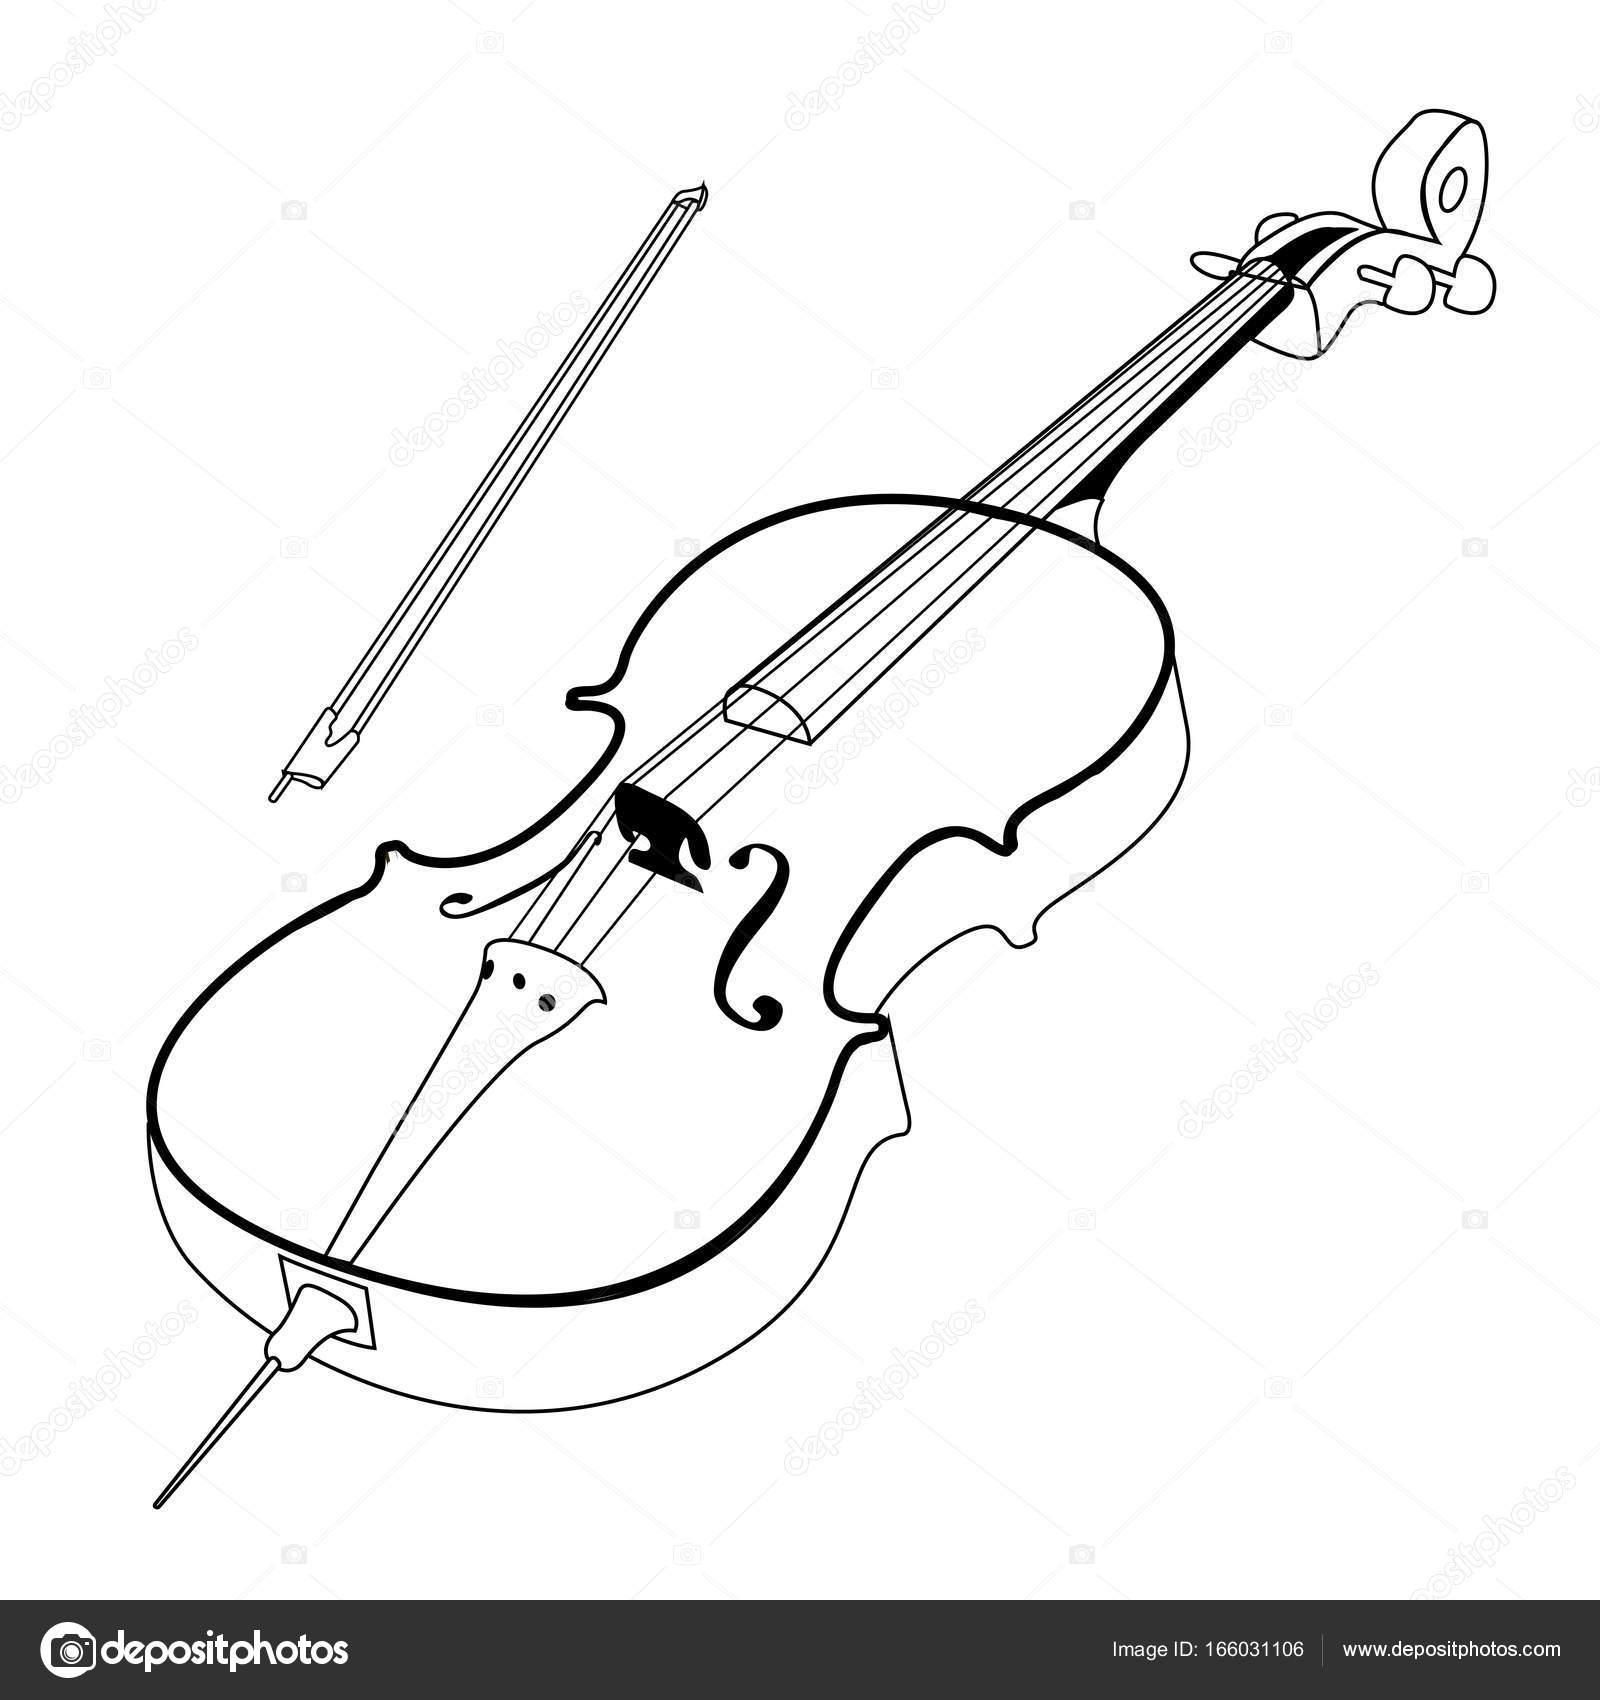 1600x1700 Isolated Cello Outline Stock Vector C LAUDiseno